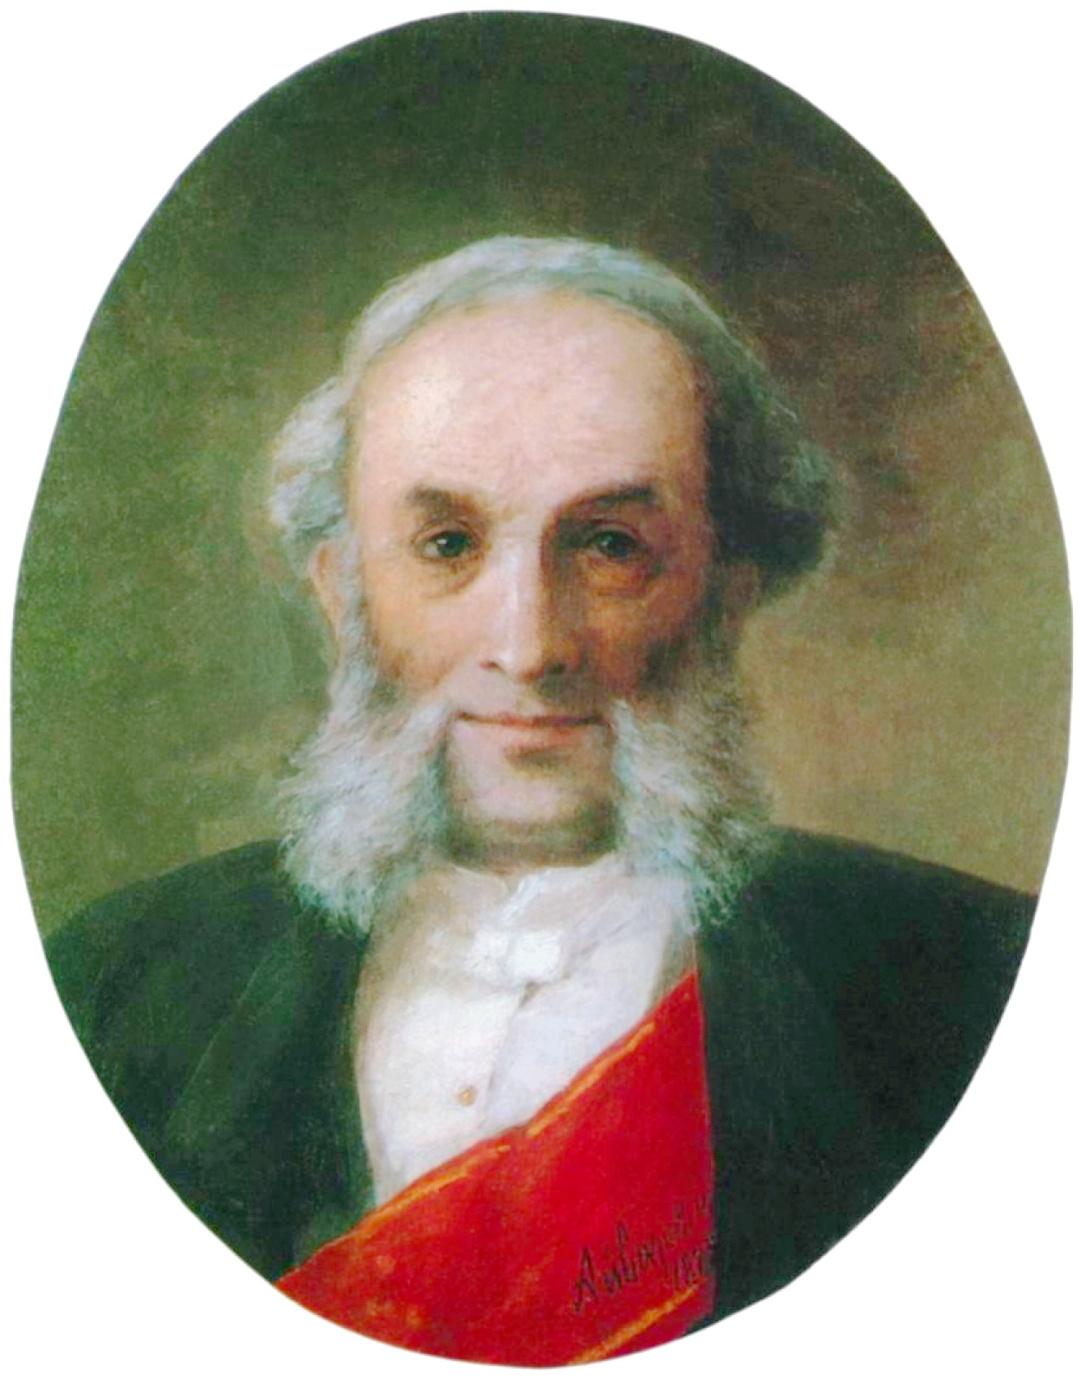 Автопортрет, 1881 р. 1